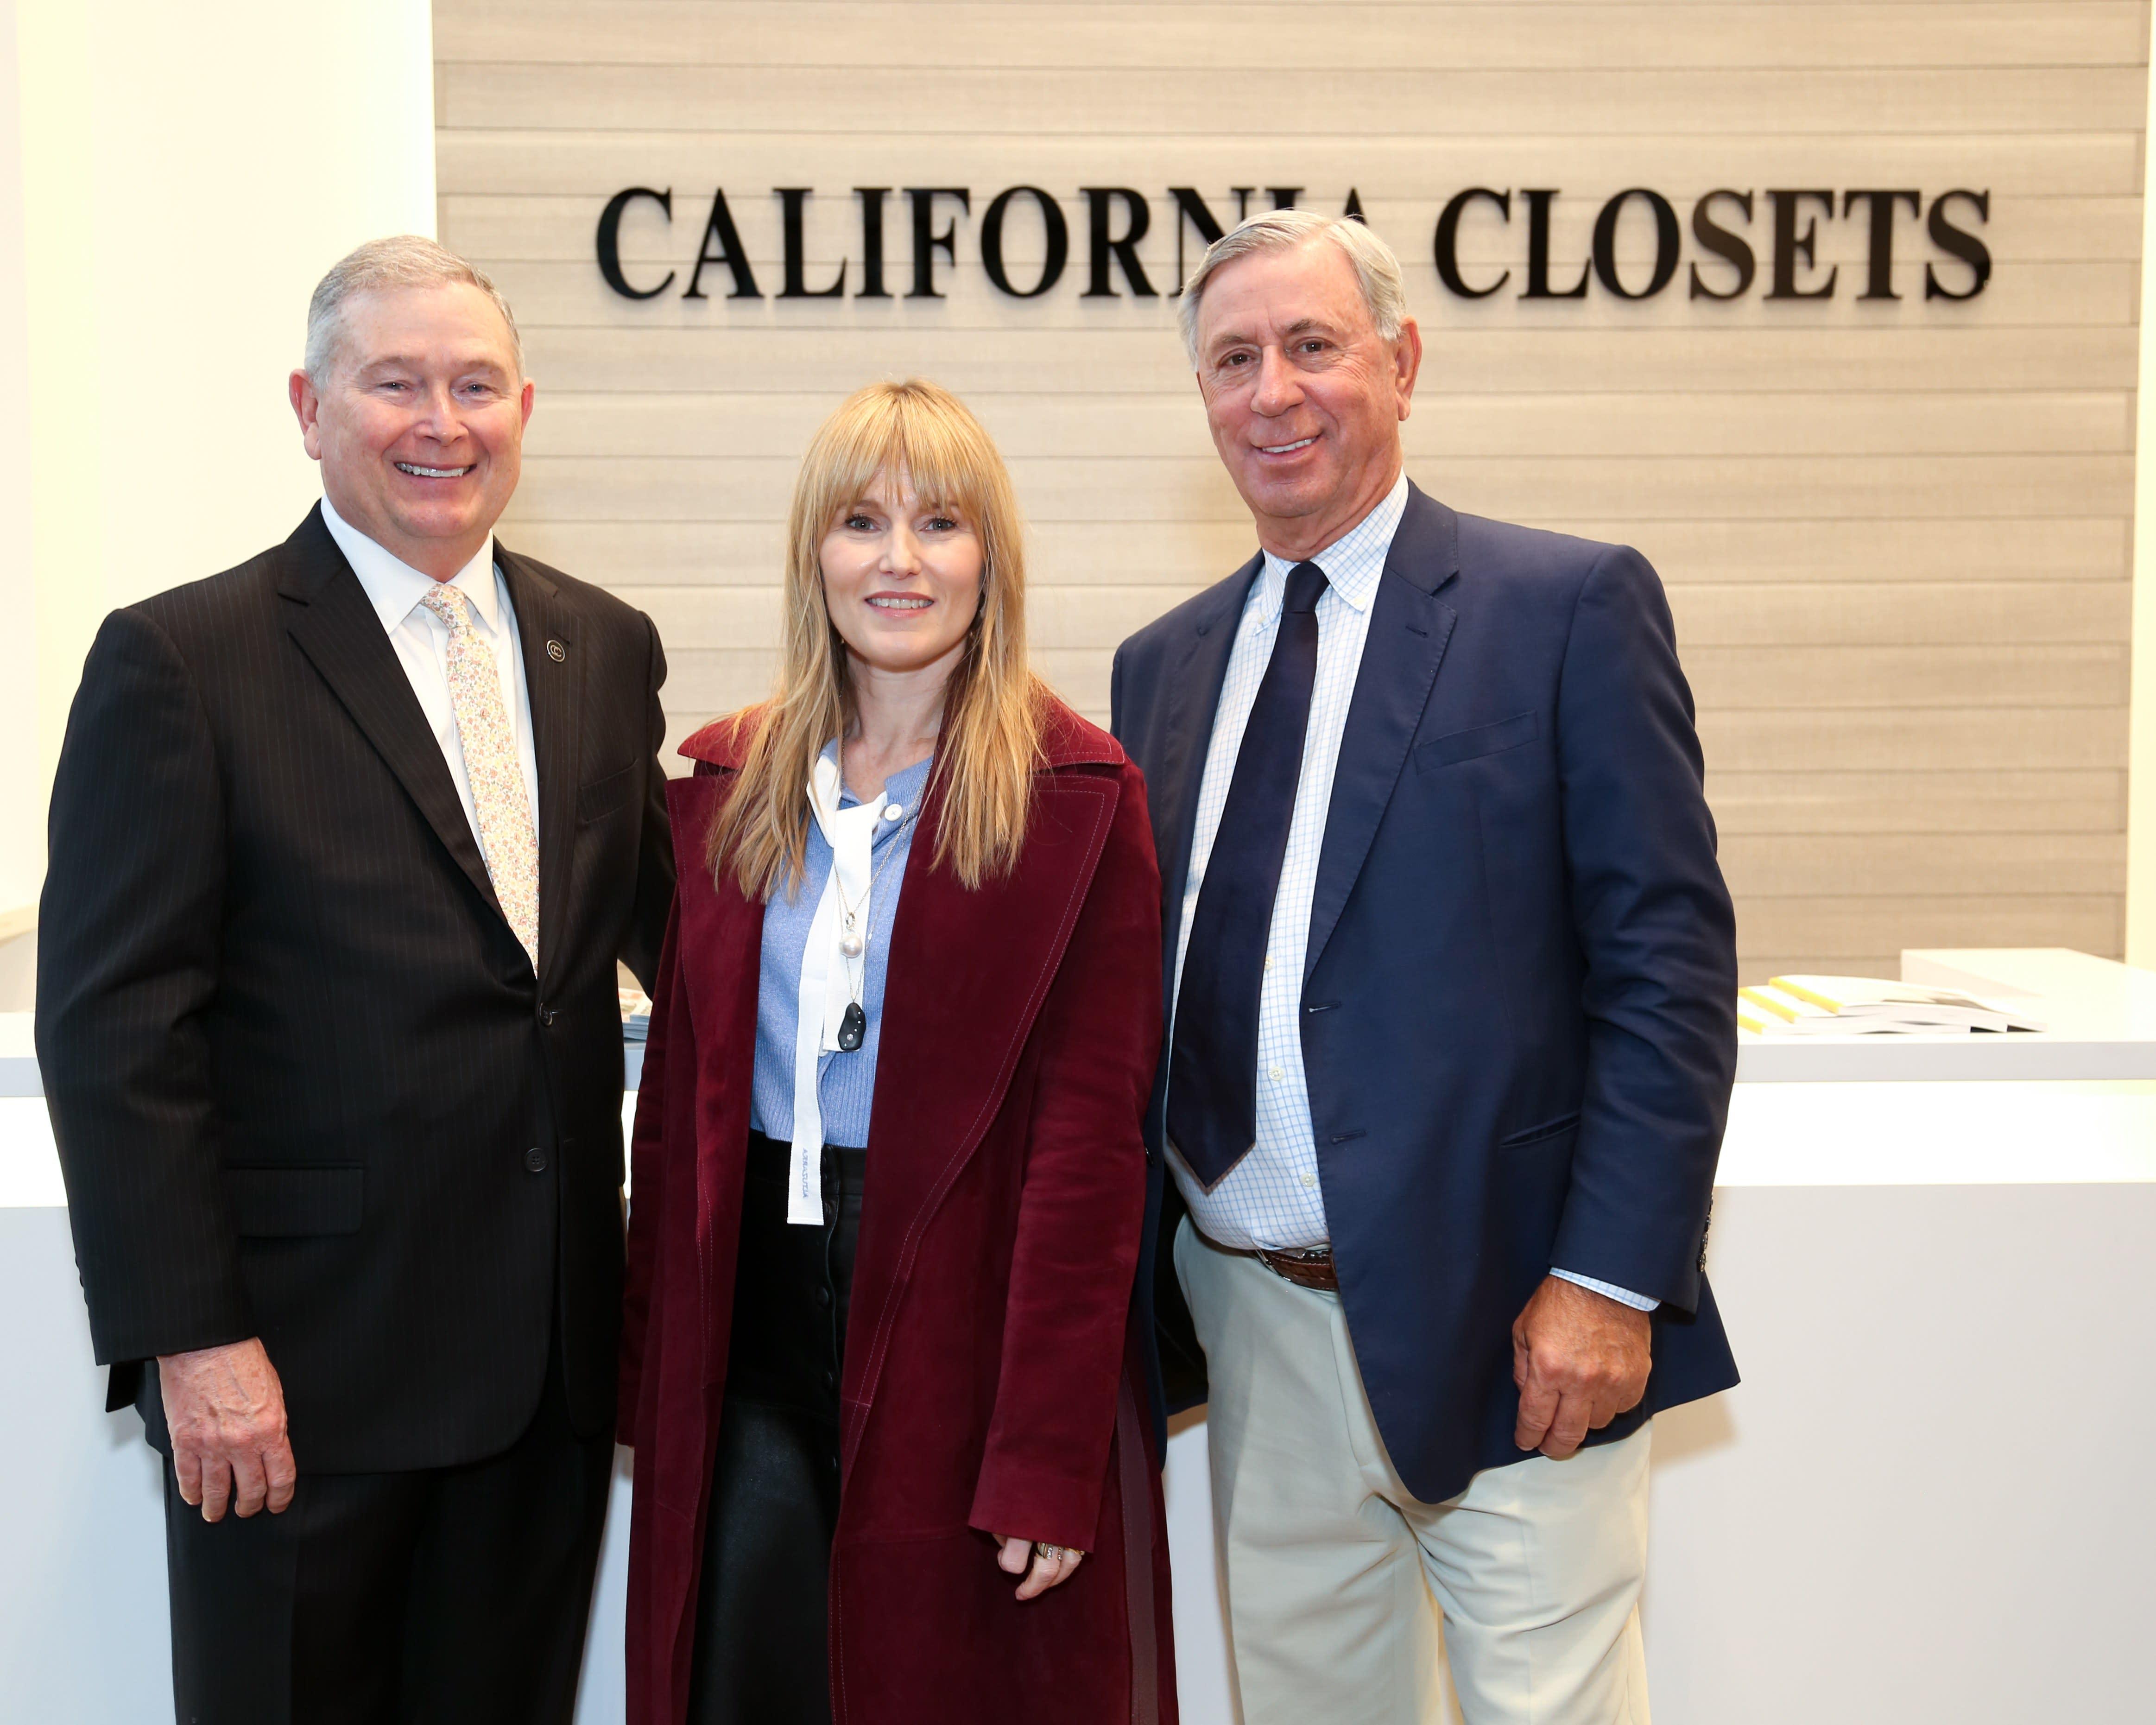 AD Editor in Chief Amy Astley with California Closets CEO Bill Barton and California Closets NY owner Bob Westenberg